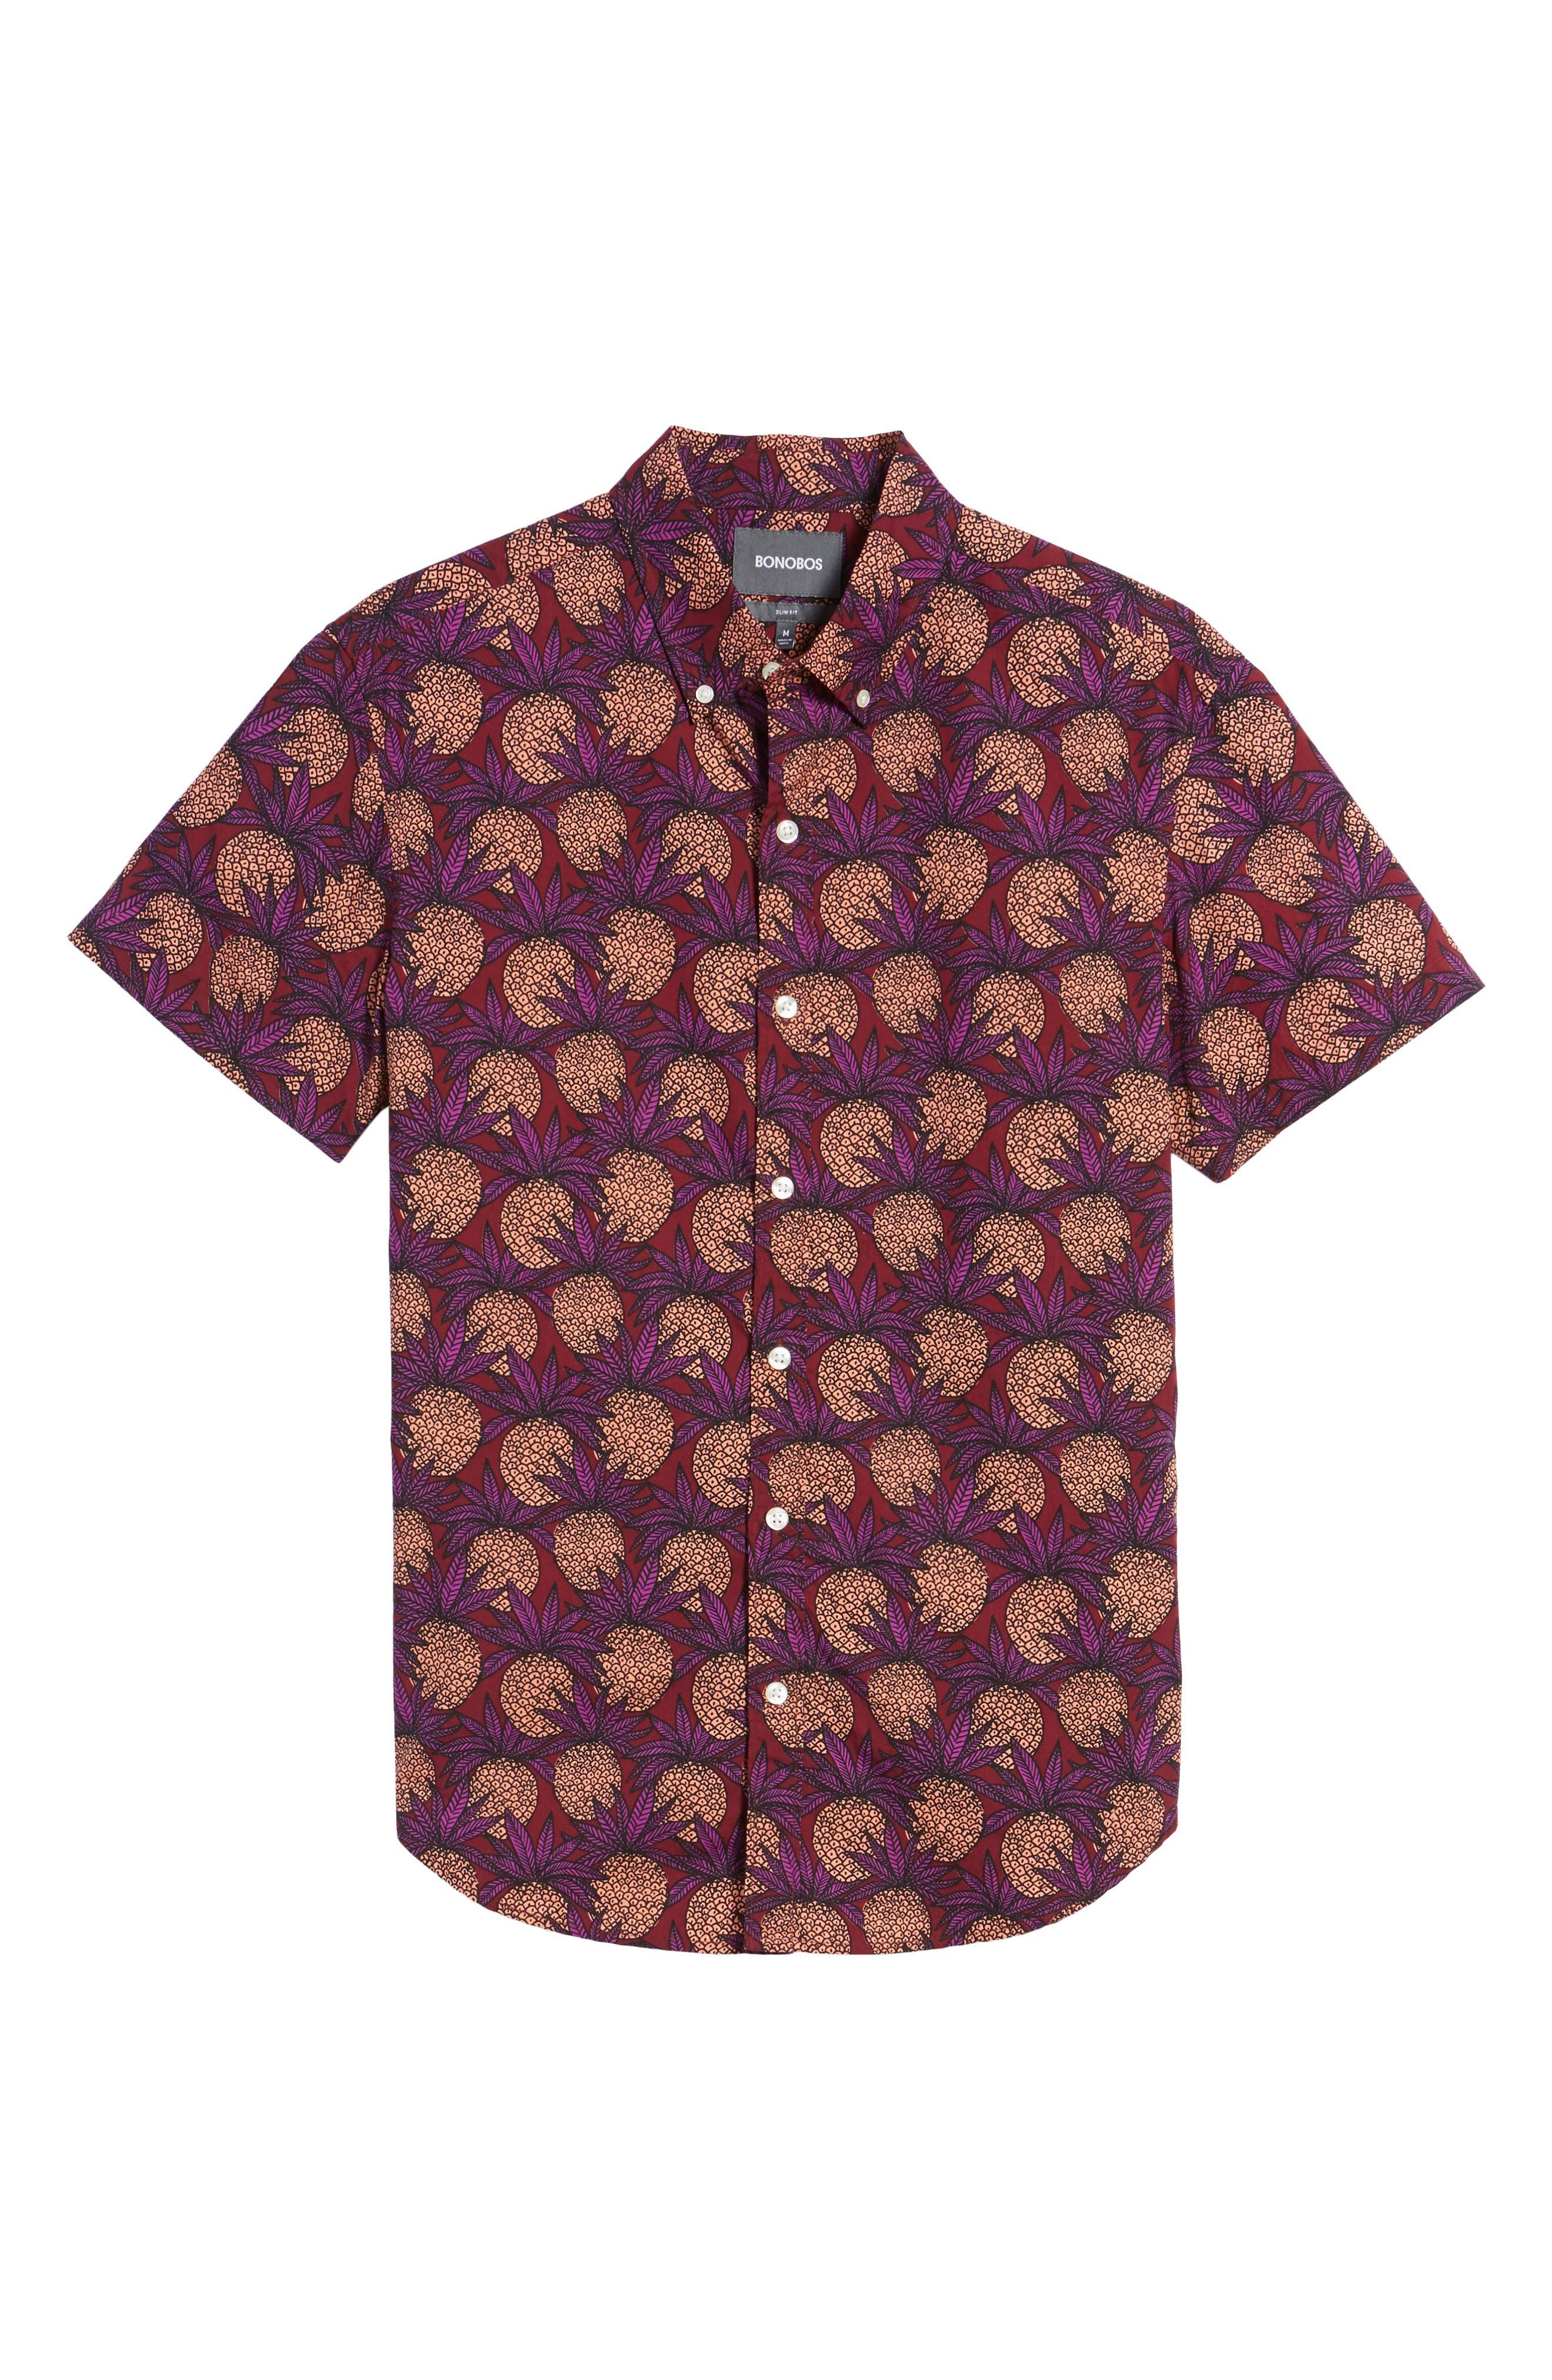 Slim Fit Pineapple Sport Shirt,                             Alternate thumbnail 6, color,                             Pineapple Fields Sangria